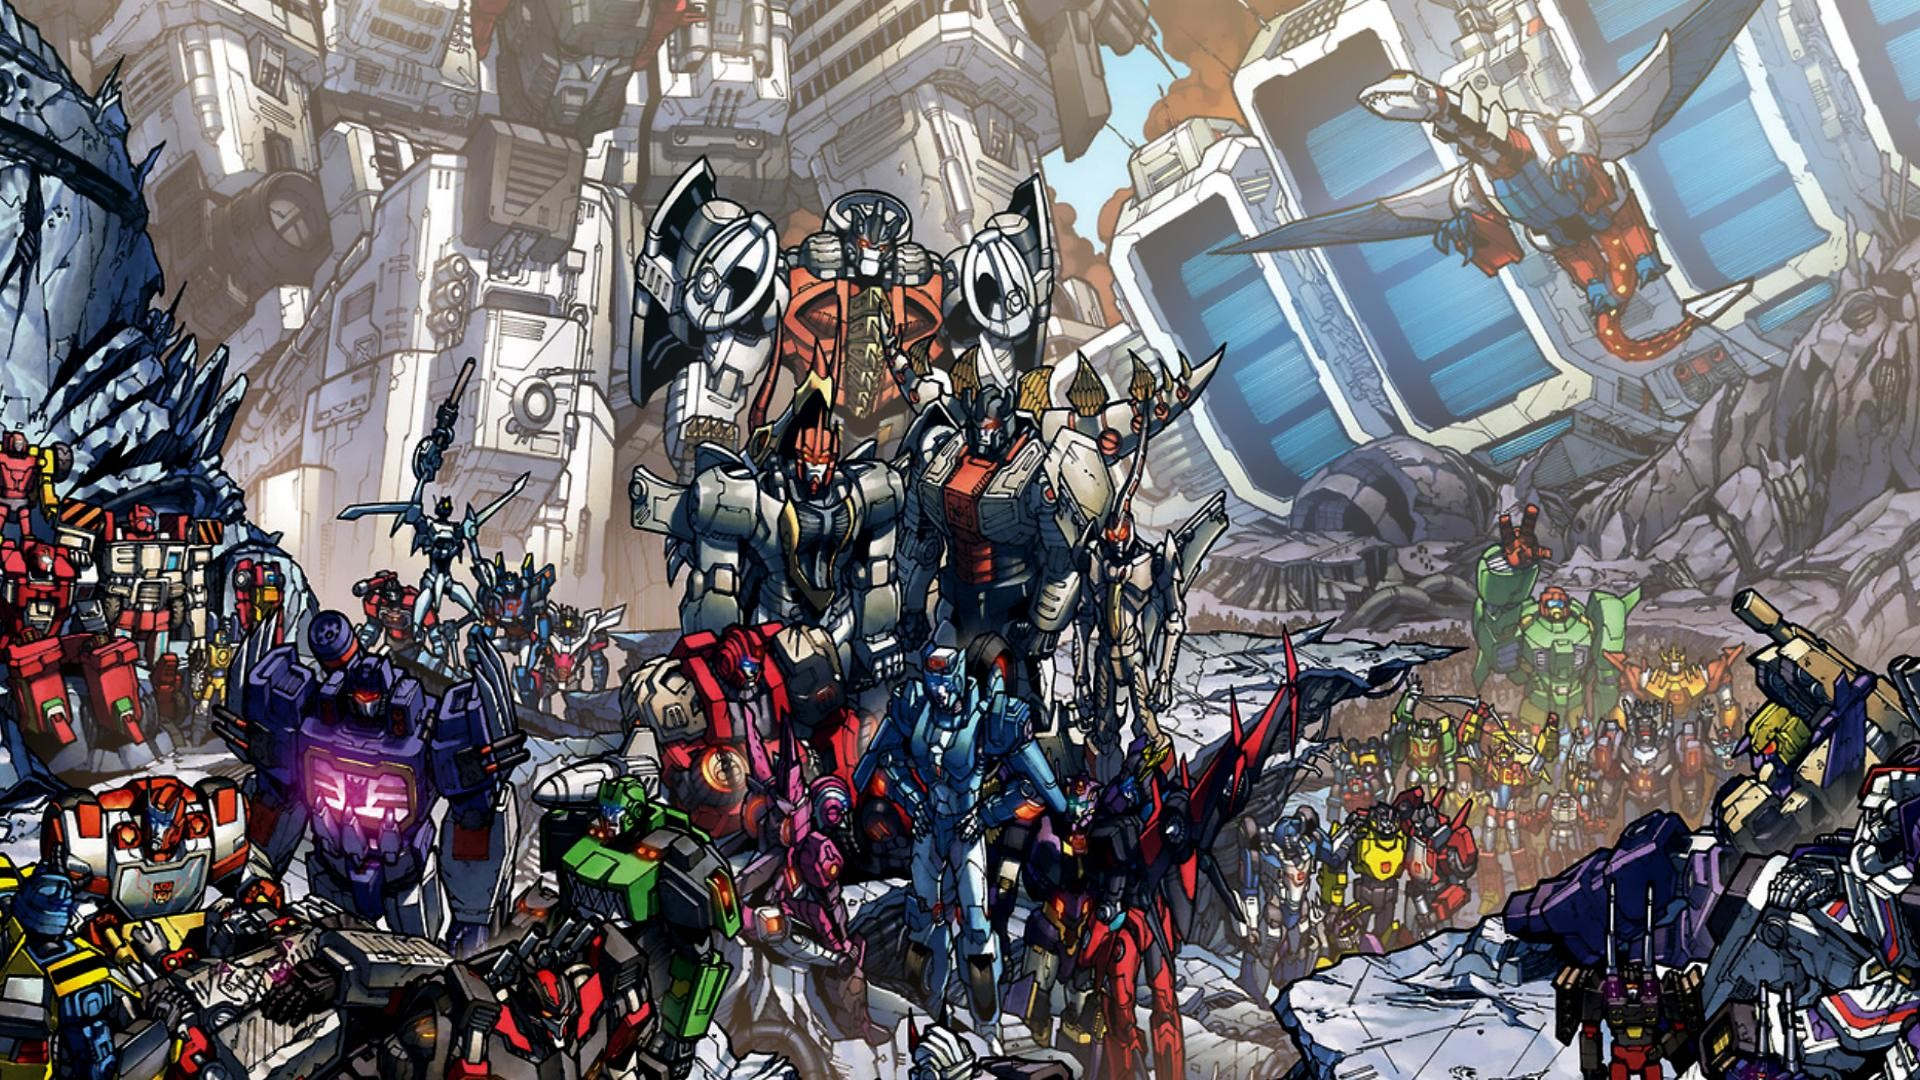 Transformers Fall Of Cybertron Wallpaper 1920x1080 Cybertron Wallpaper 76 Images